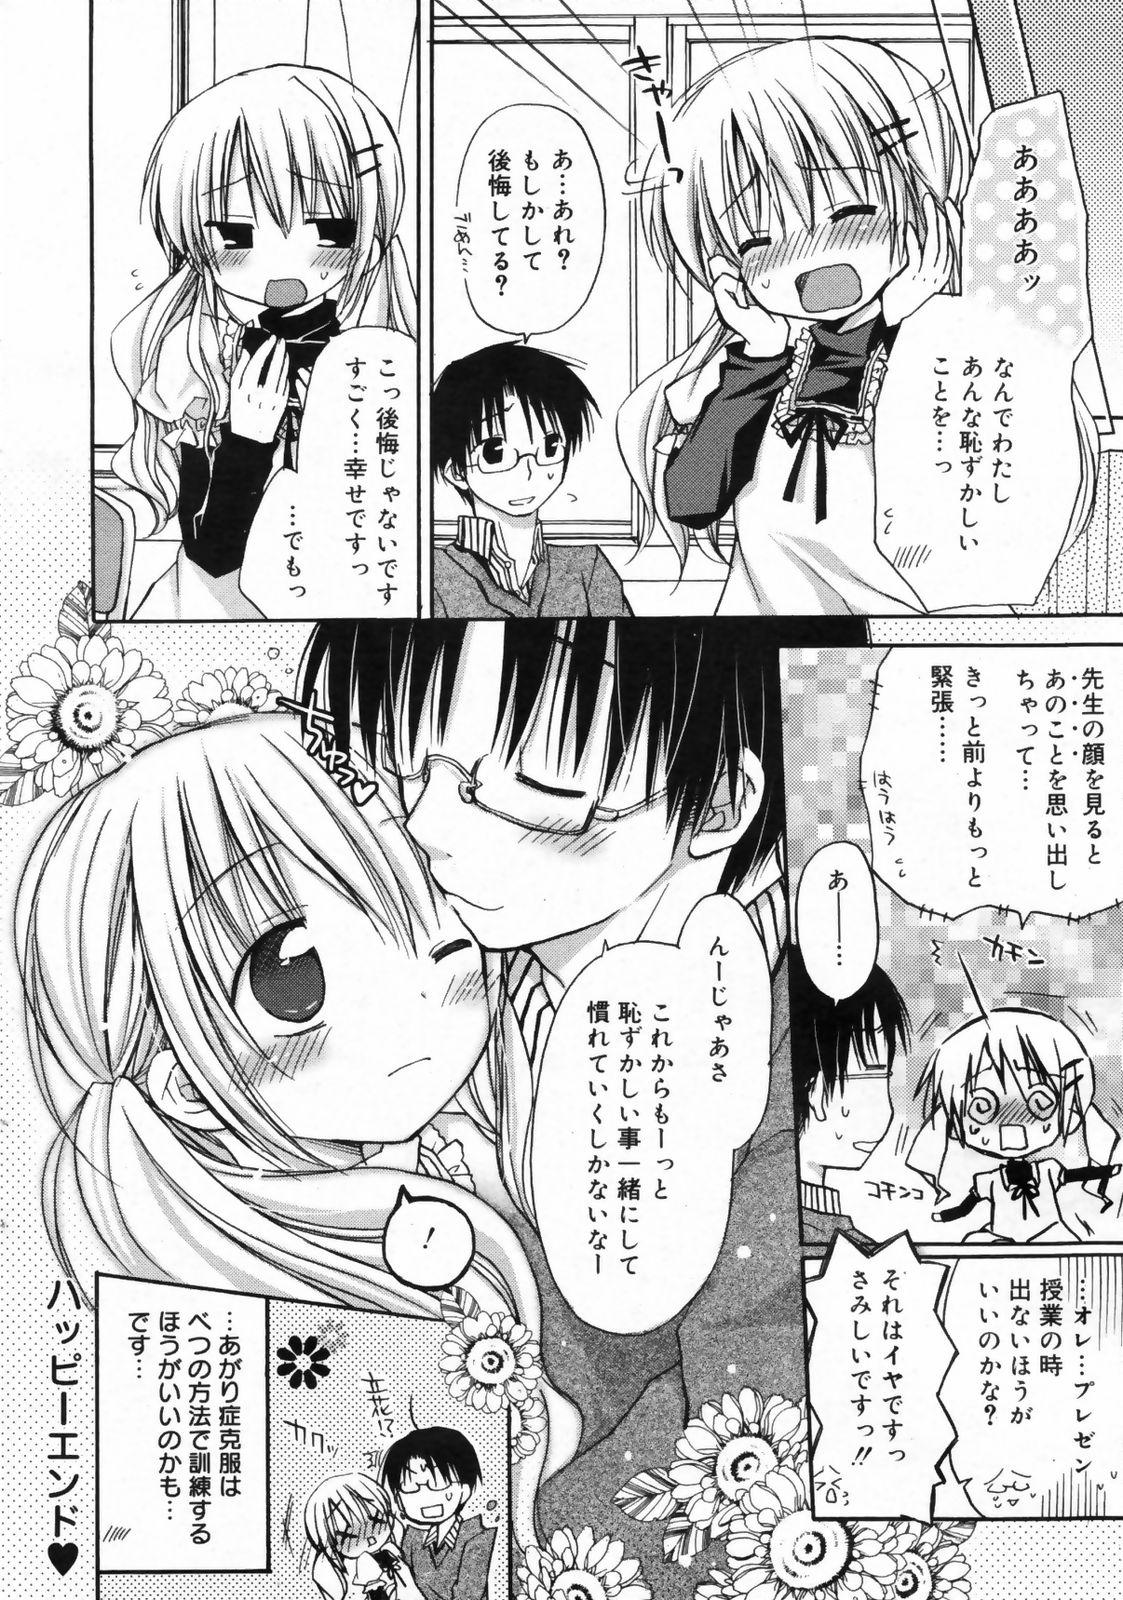 Manga Bangaichi 2009-02 Vol. 234 35